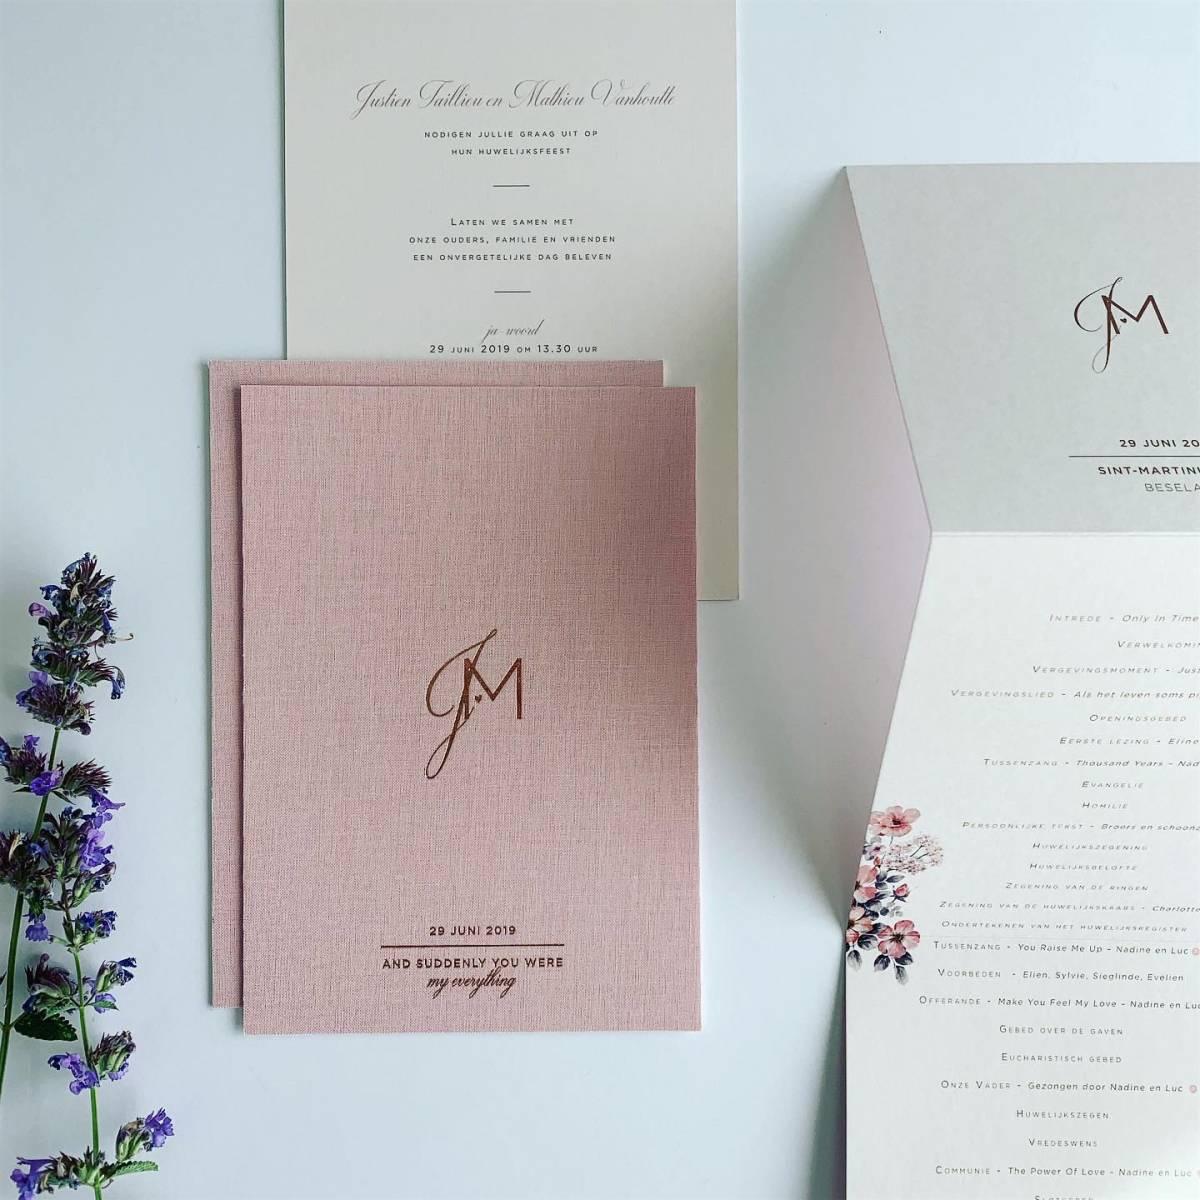 Scarabar - Trouwuitnodiging - Huwelijksuitnodiging - Drukwerk - Huwelijk - Trouw - Bruiloft - House of Weddings - 29